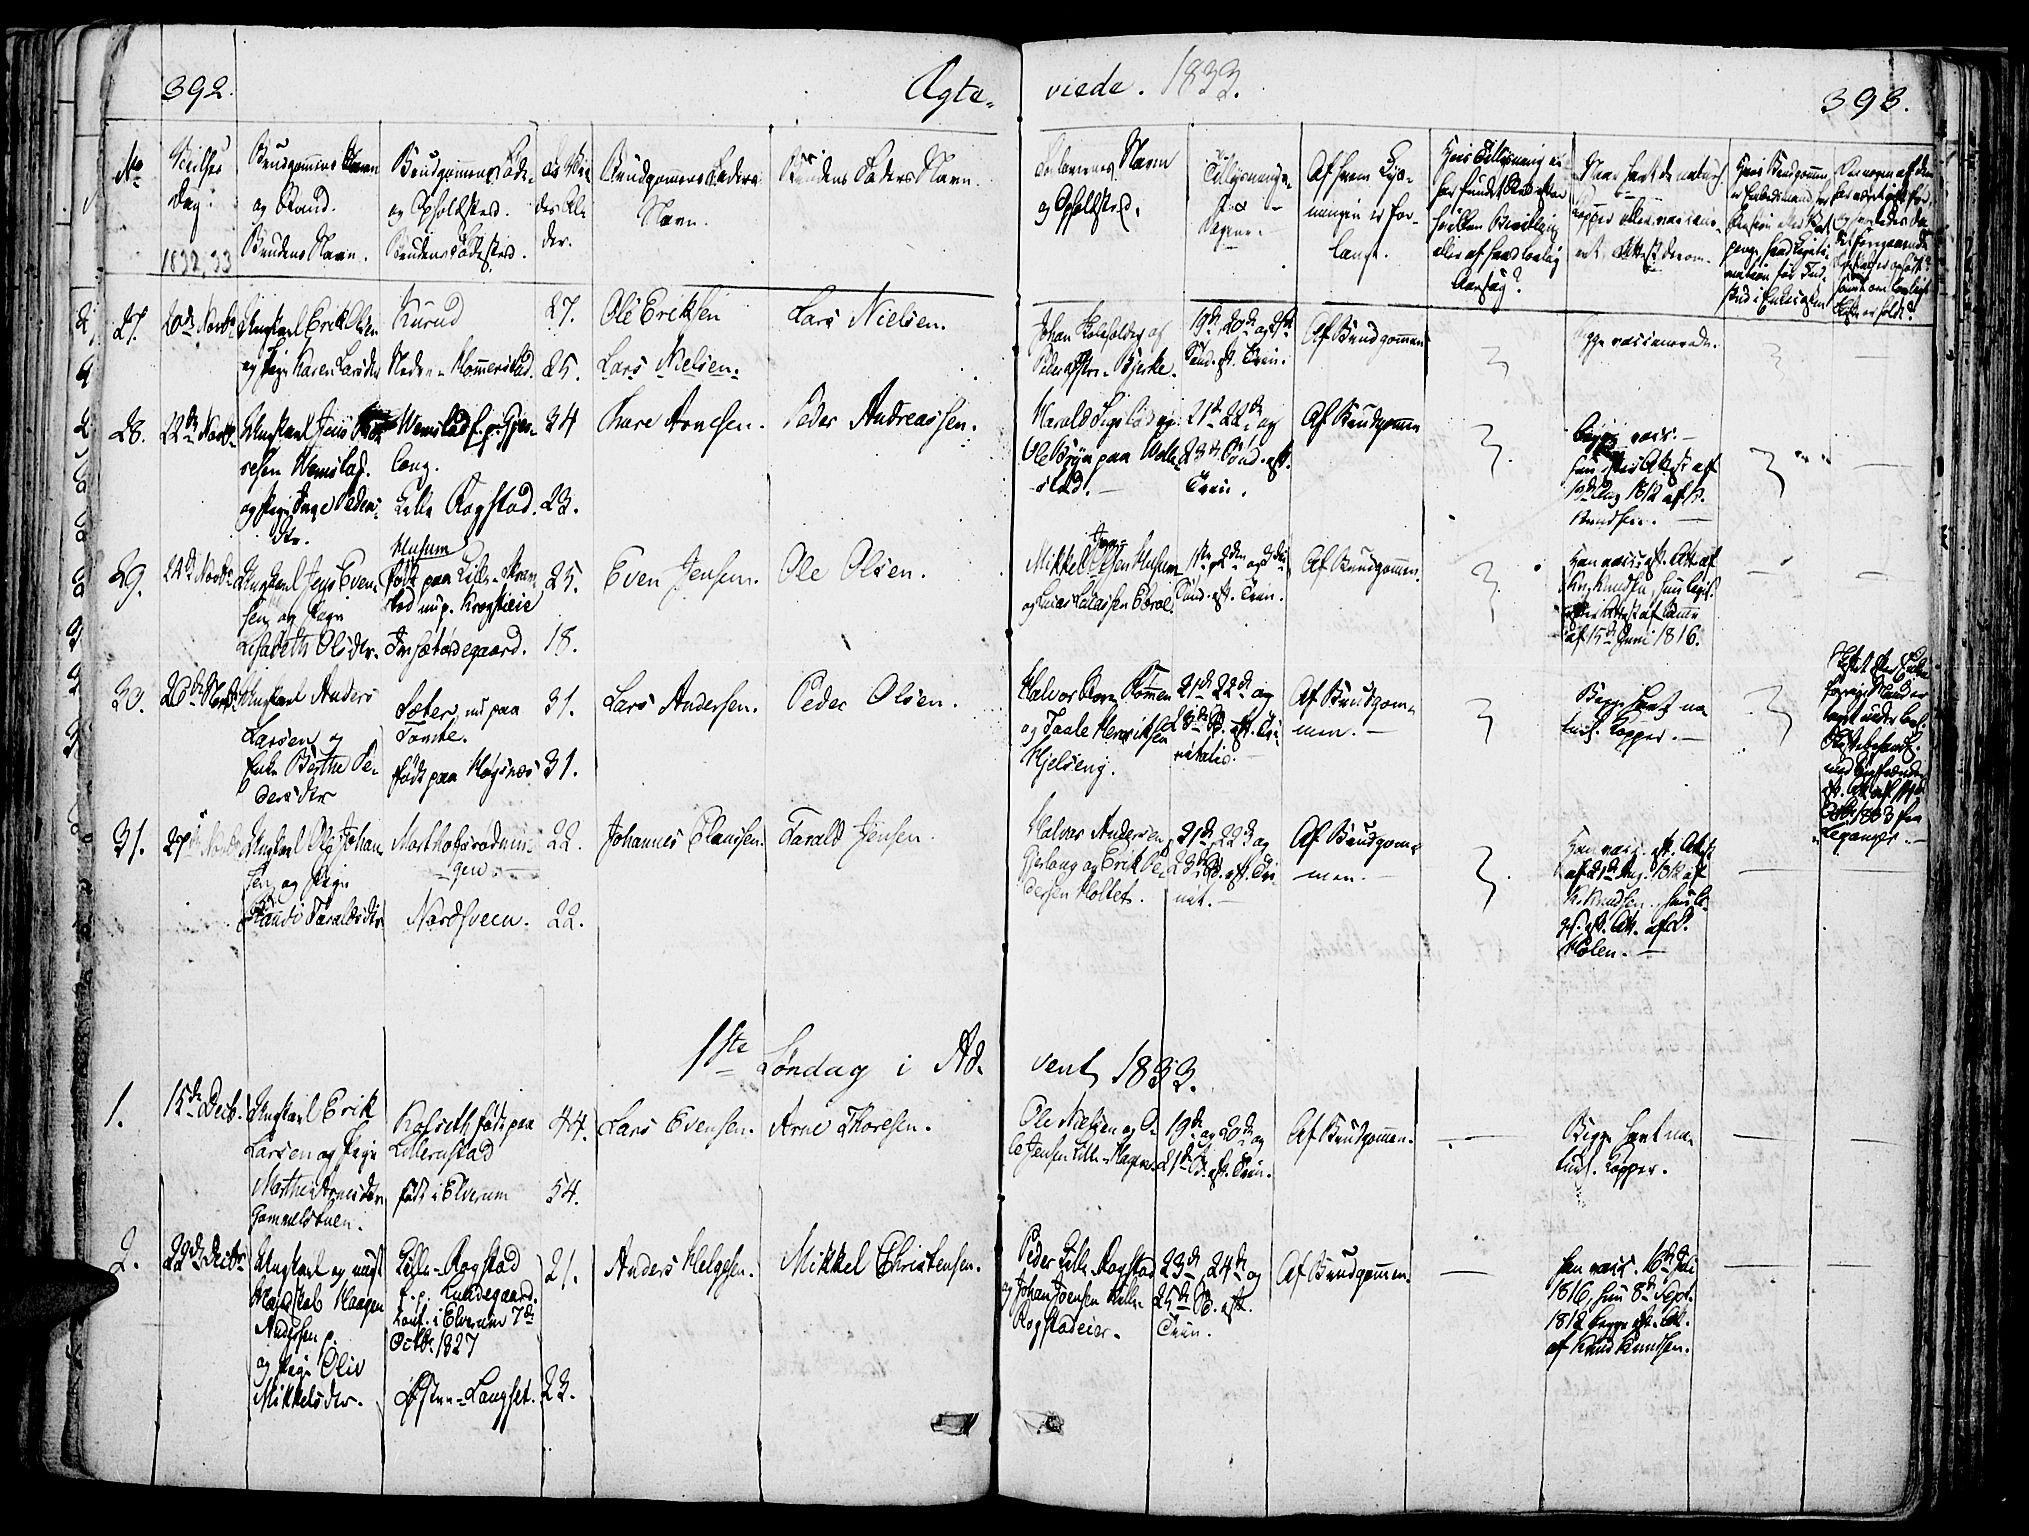 SAH, Løten prestekontor, K/Ka/L0006: Ministerialbok nr. 6, 1832-1849, s. 392-393